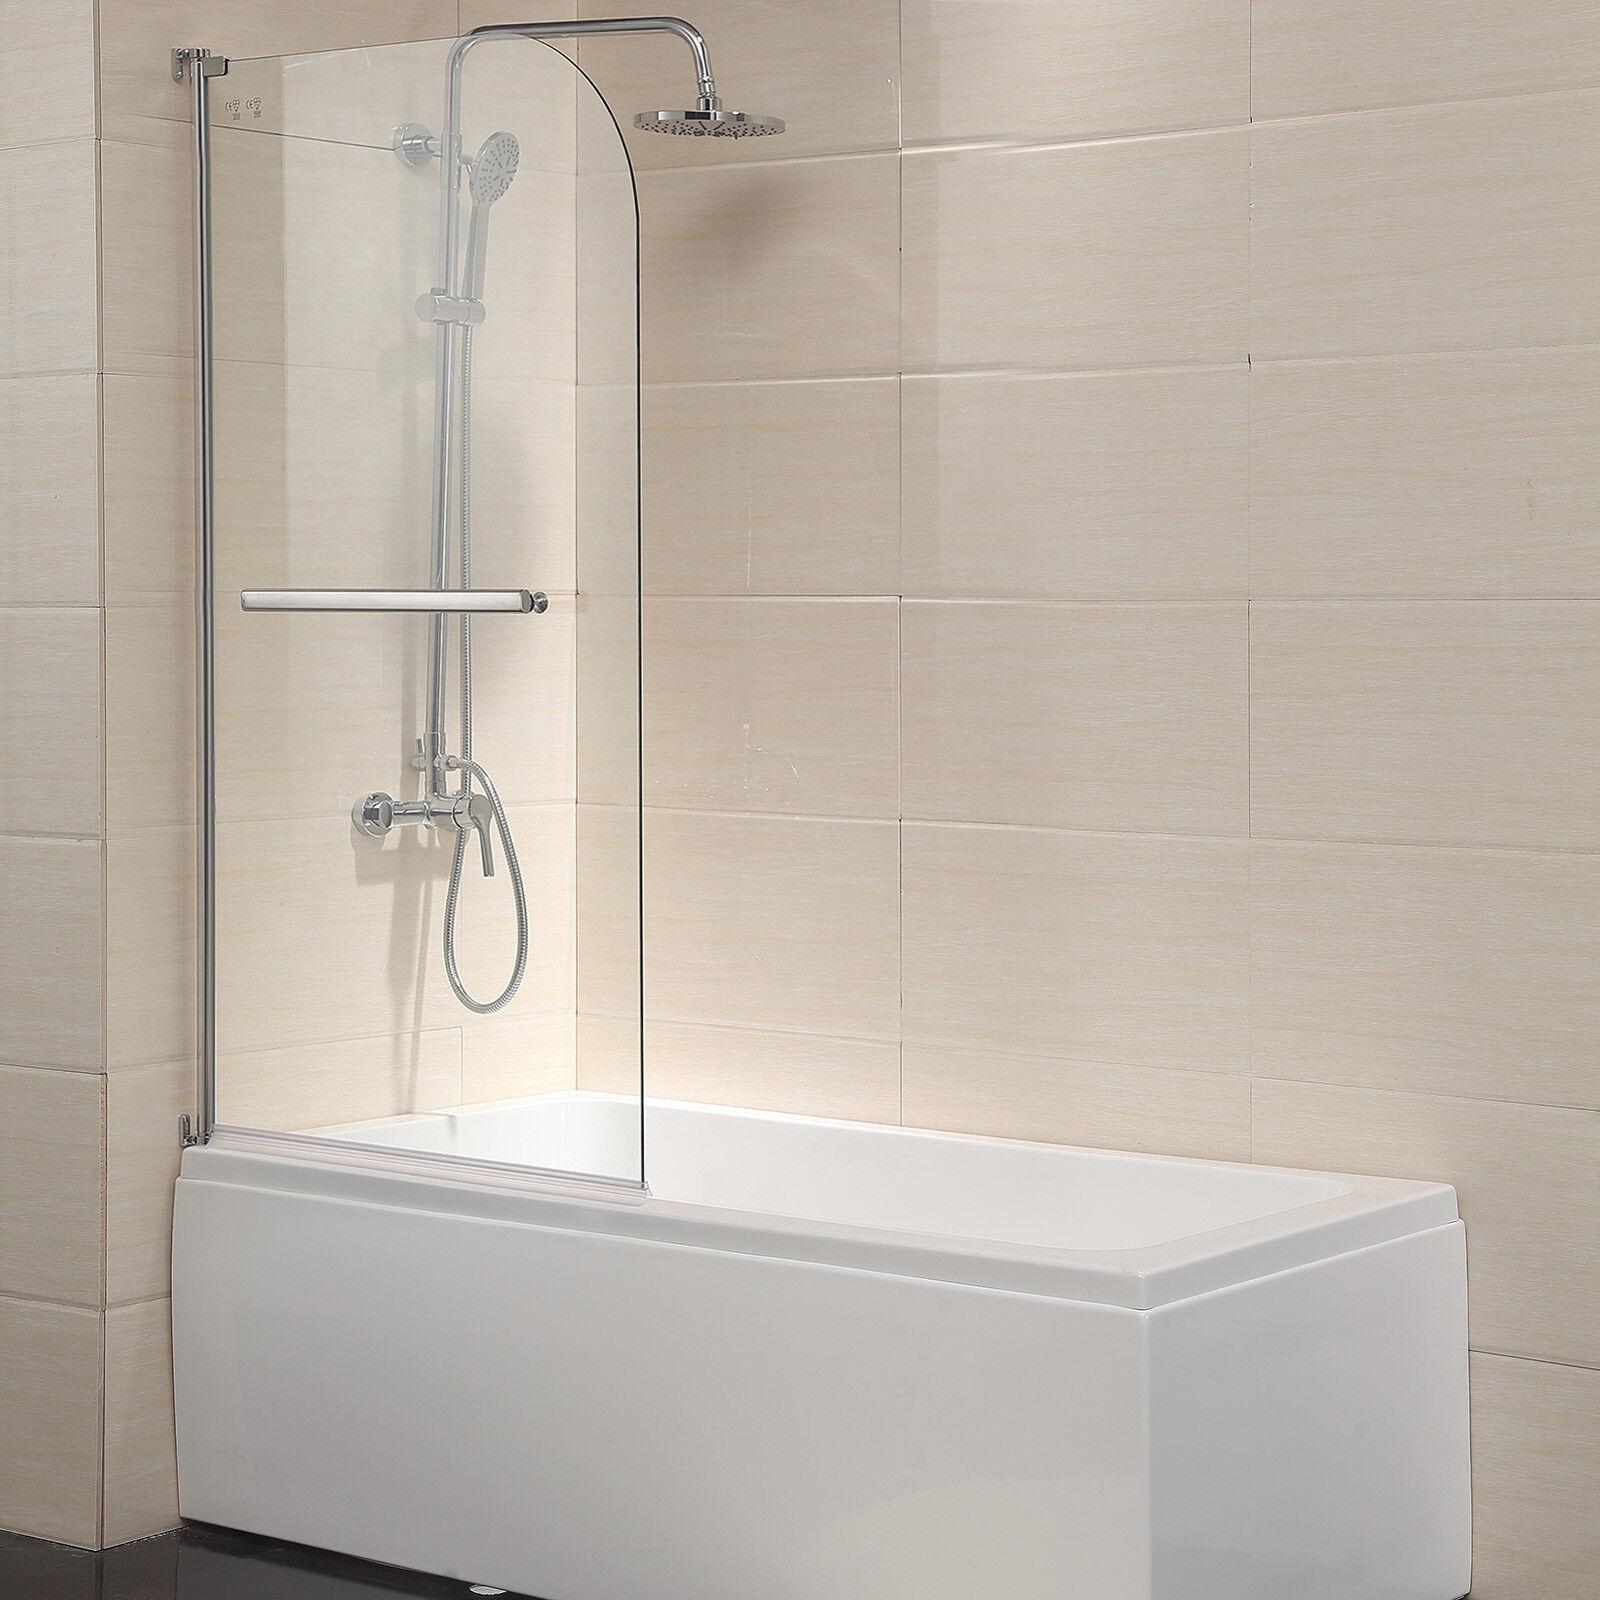 55 X31 Bathtub Shower Door Frameless 1 4 Clear Glass Chrome Finish